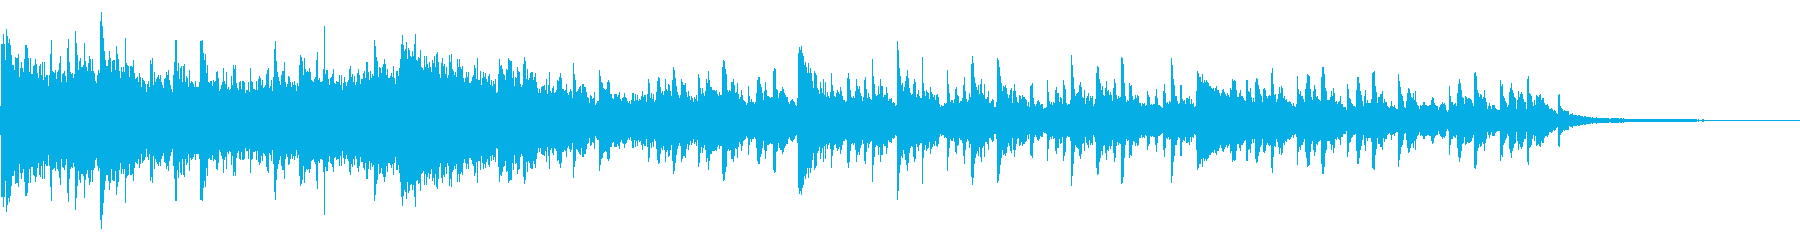 Horror / Creepy Piano BGM's reproduced waveform